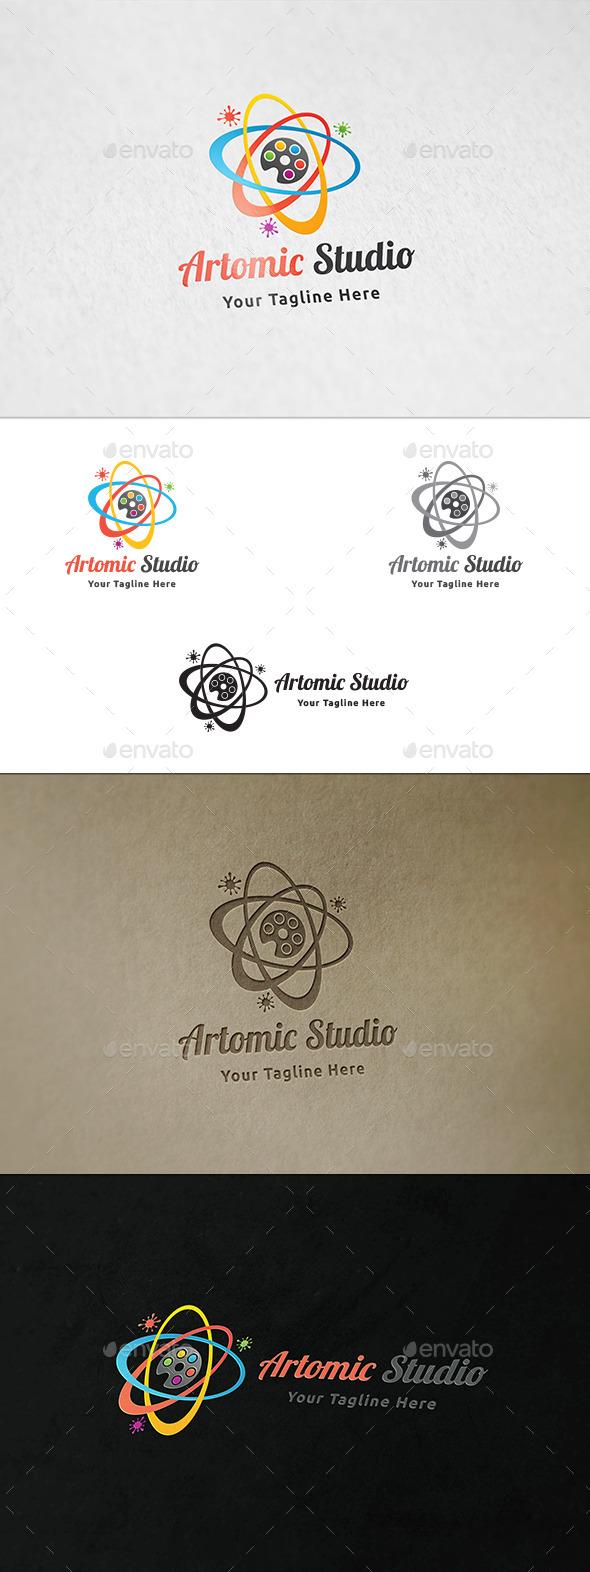 Artomic Studio Logo